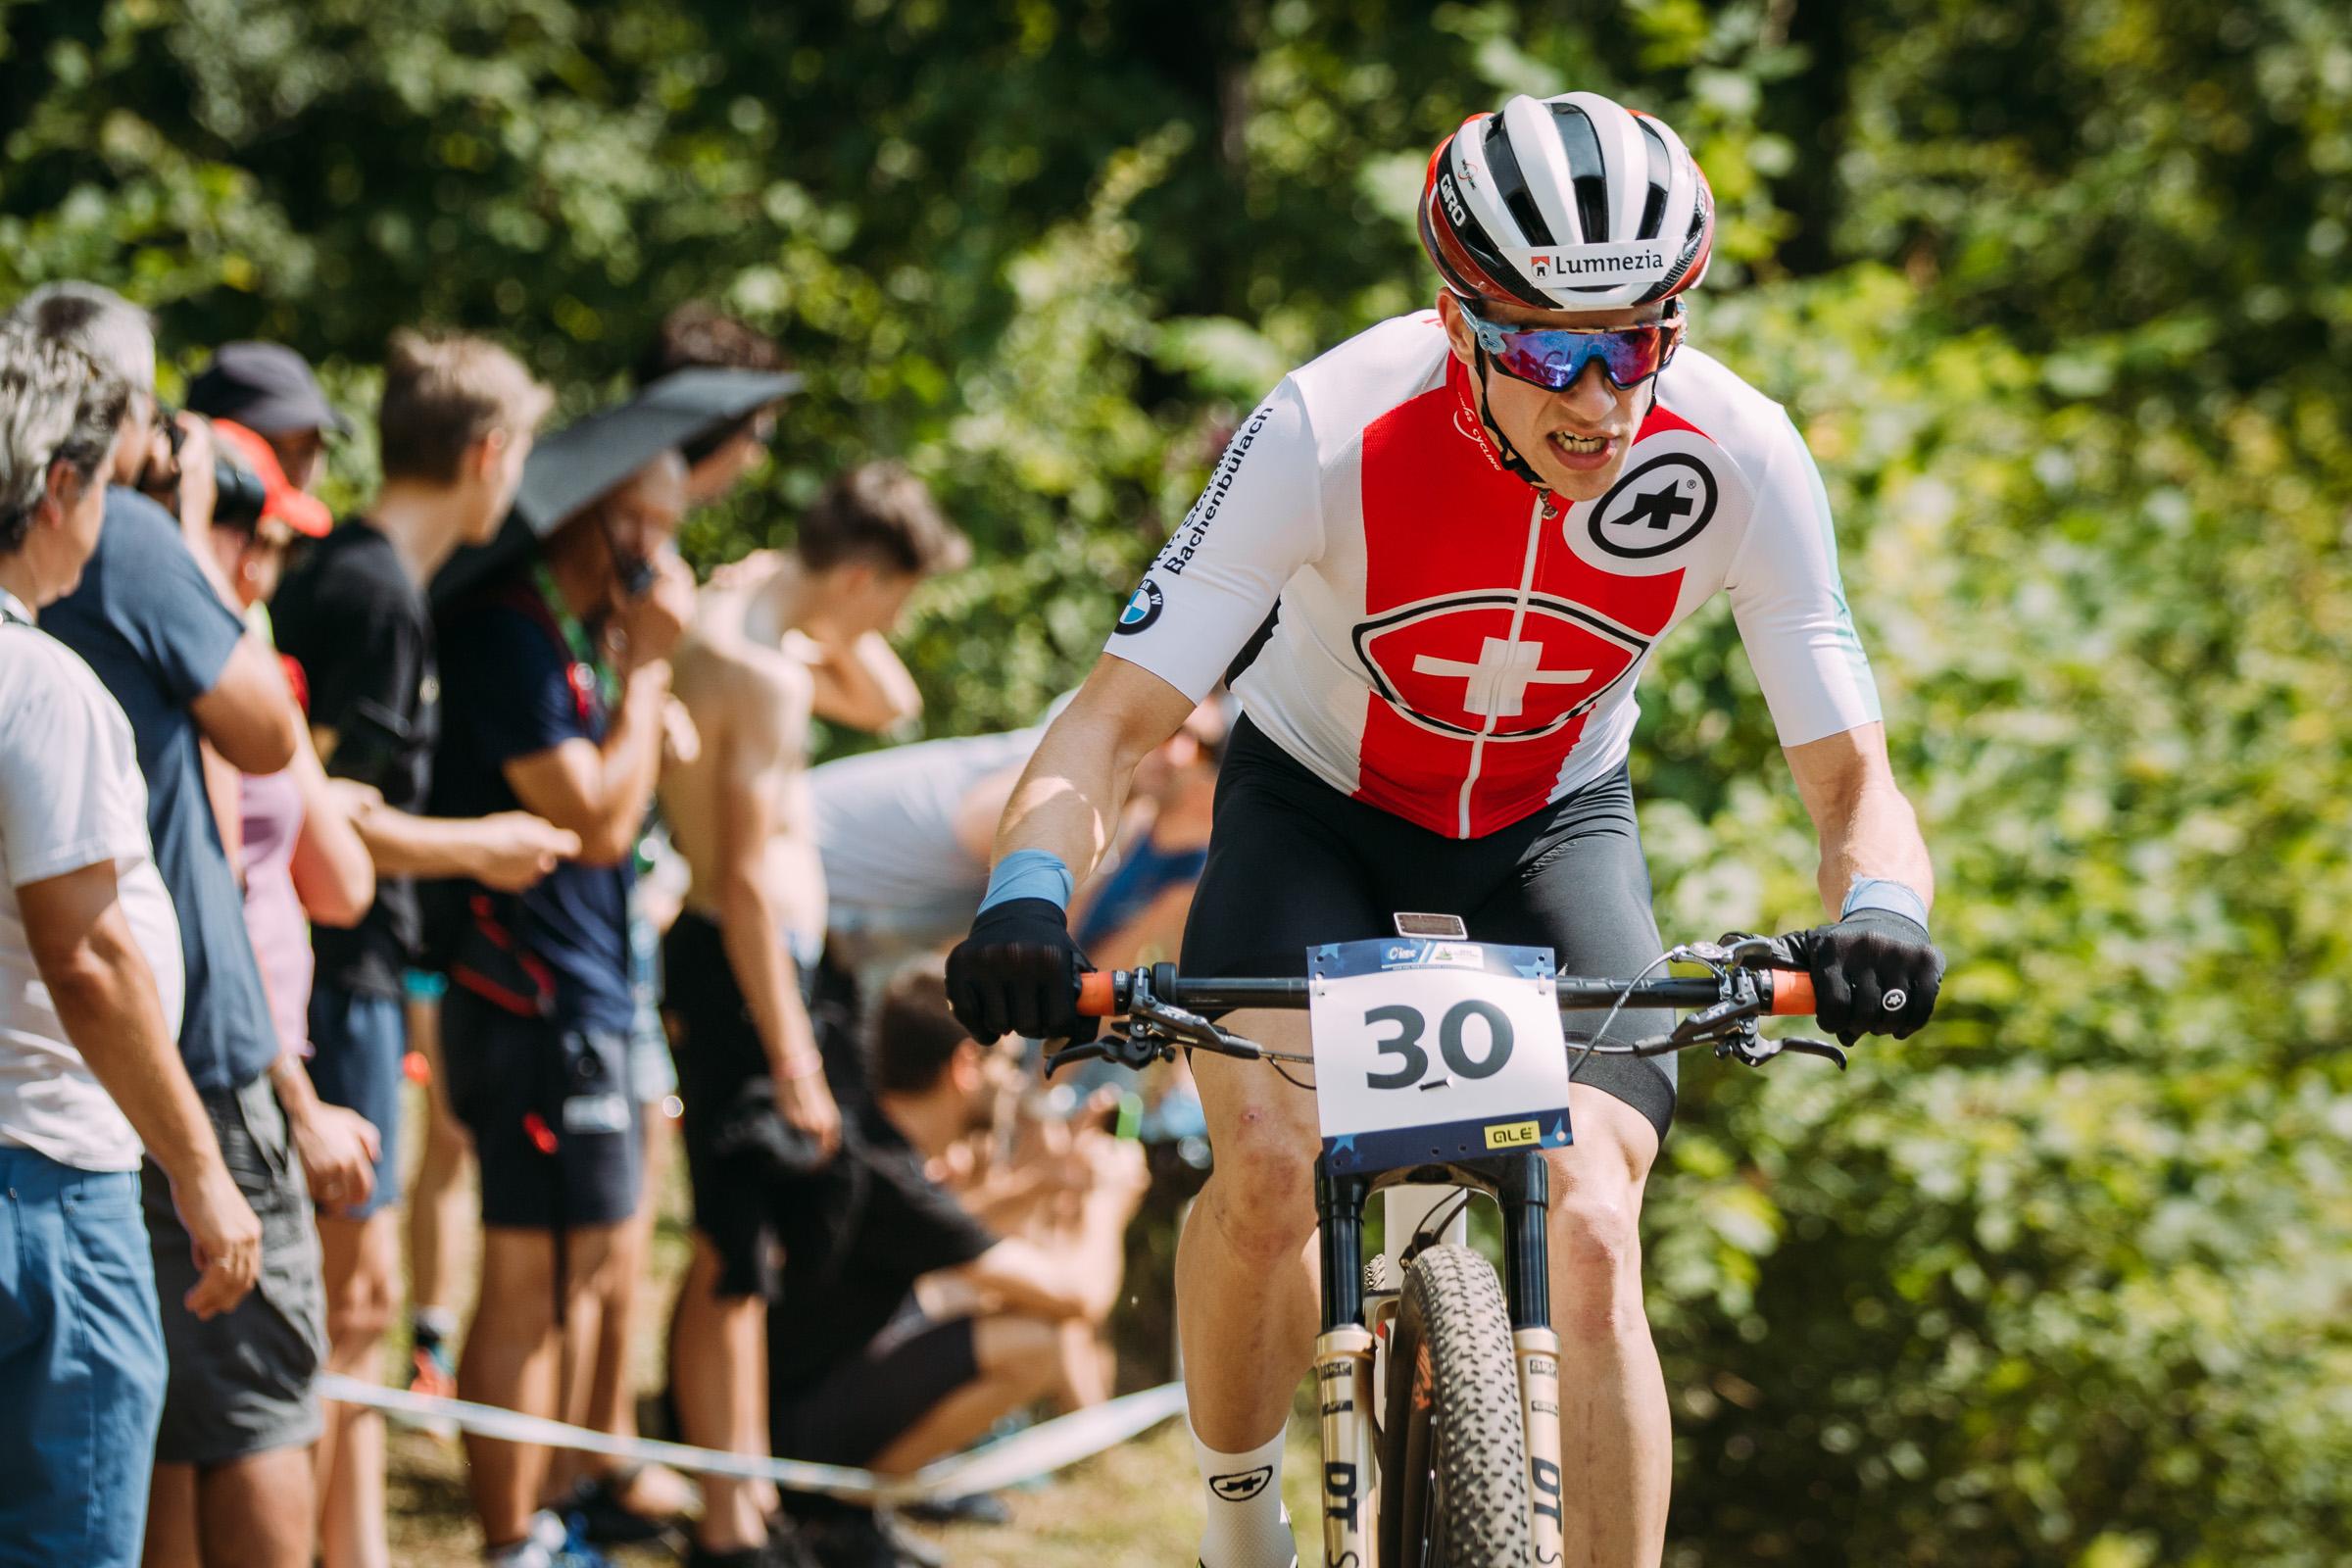 30, Albin, Vital, Bike Team Solothurn, Biketeam Solothurn, SUI